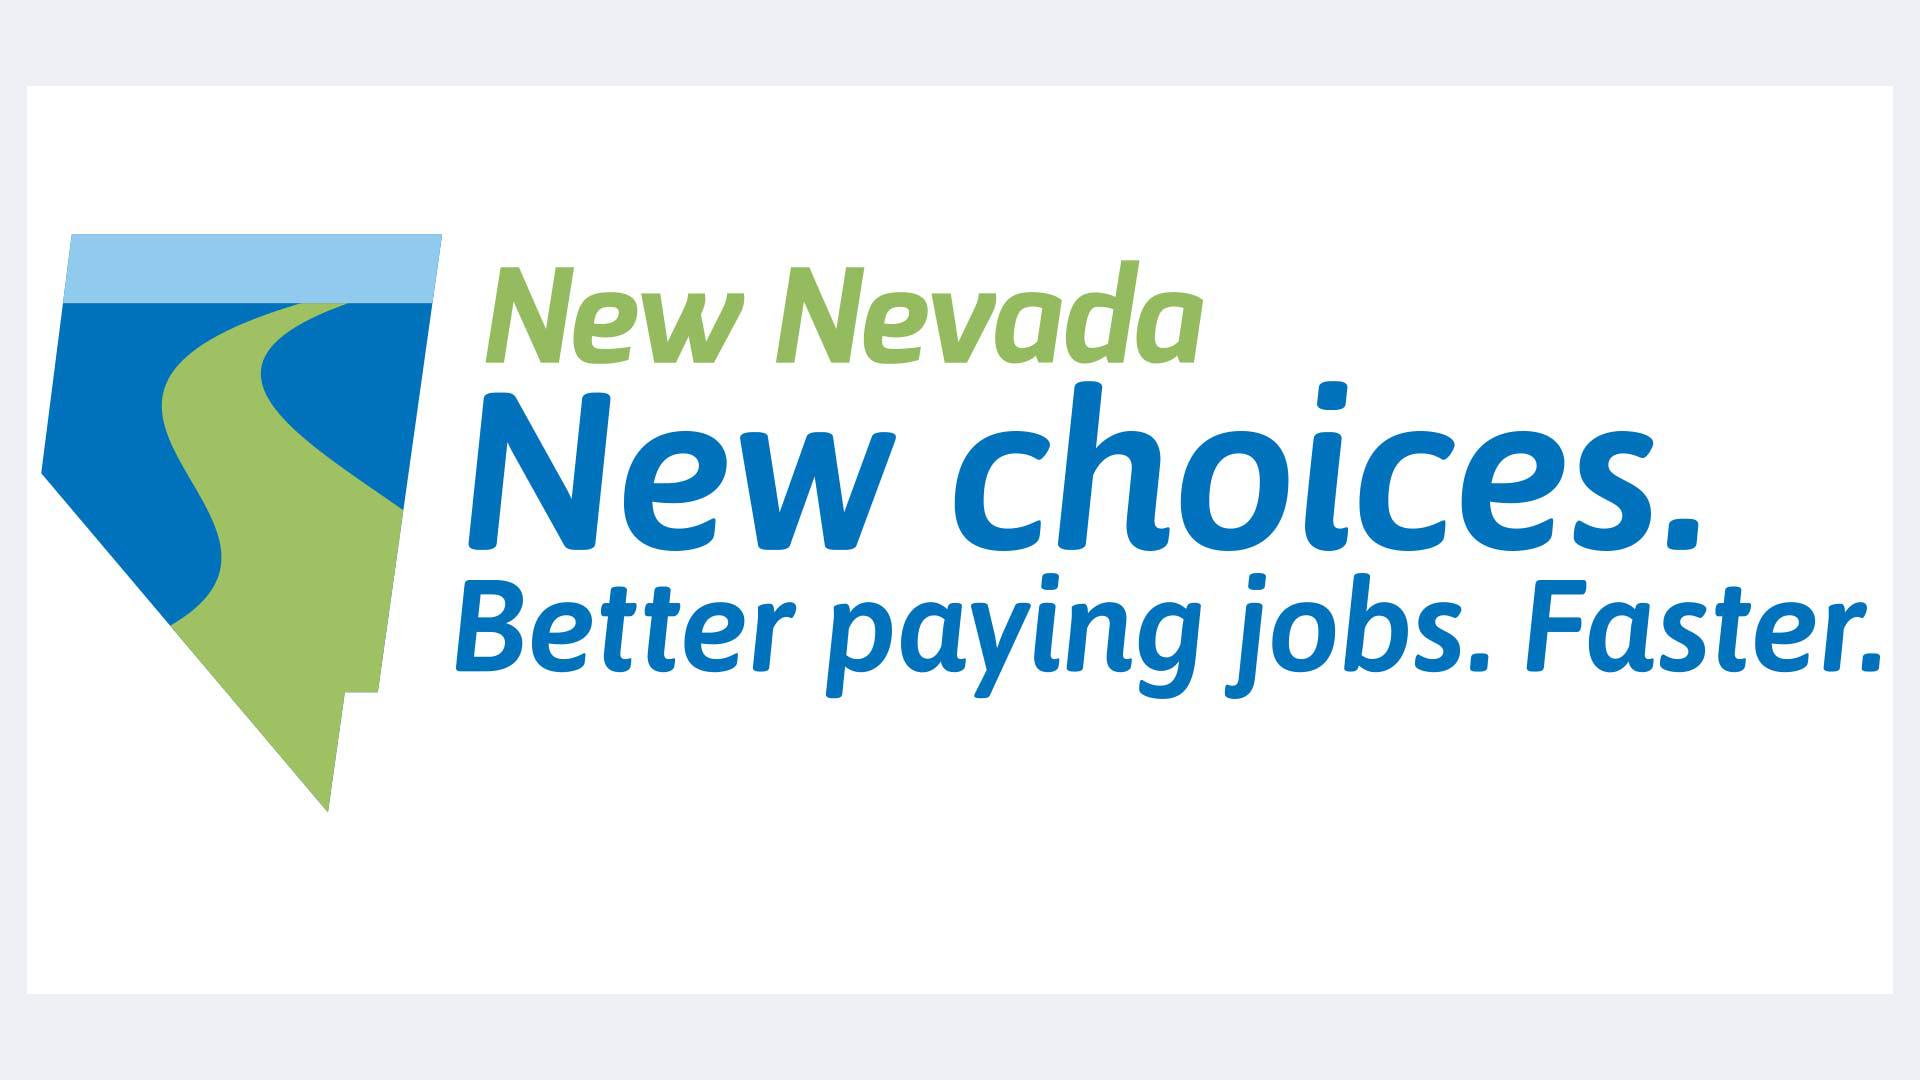 New Nevada